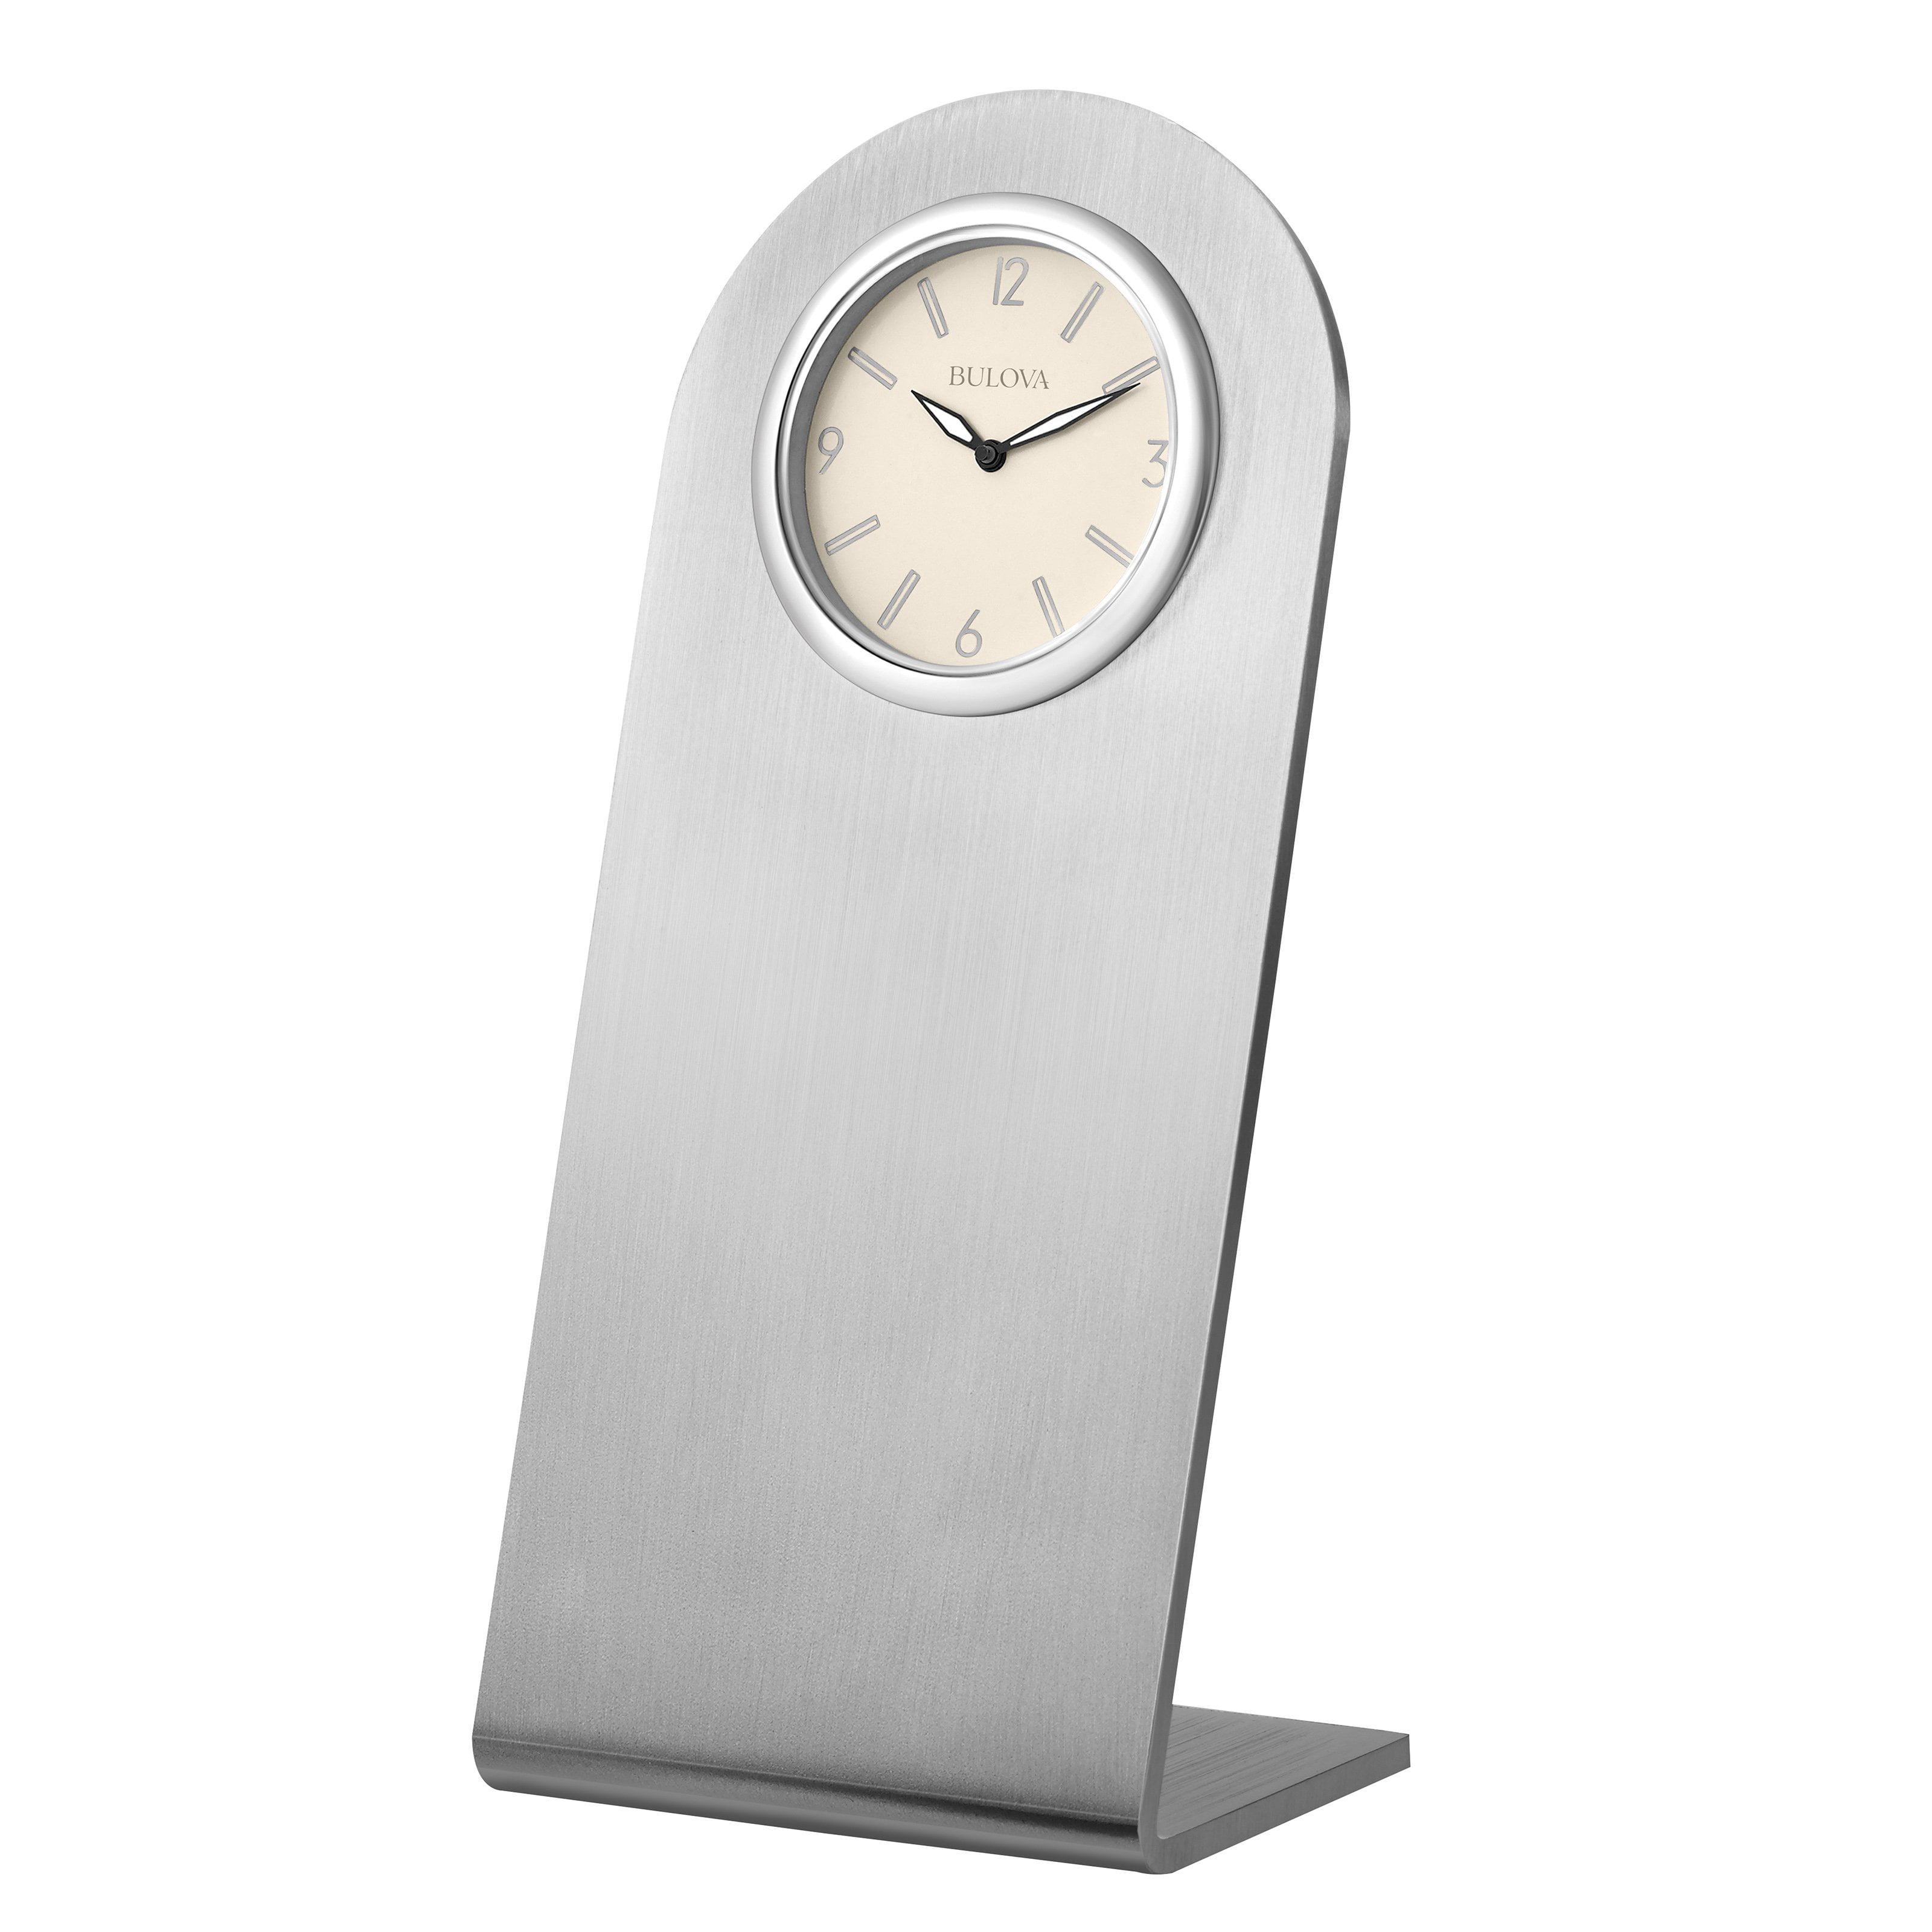 Bulova Archdale Desk Clock by Bulova Clock